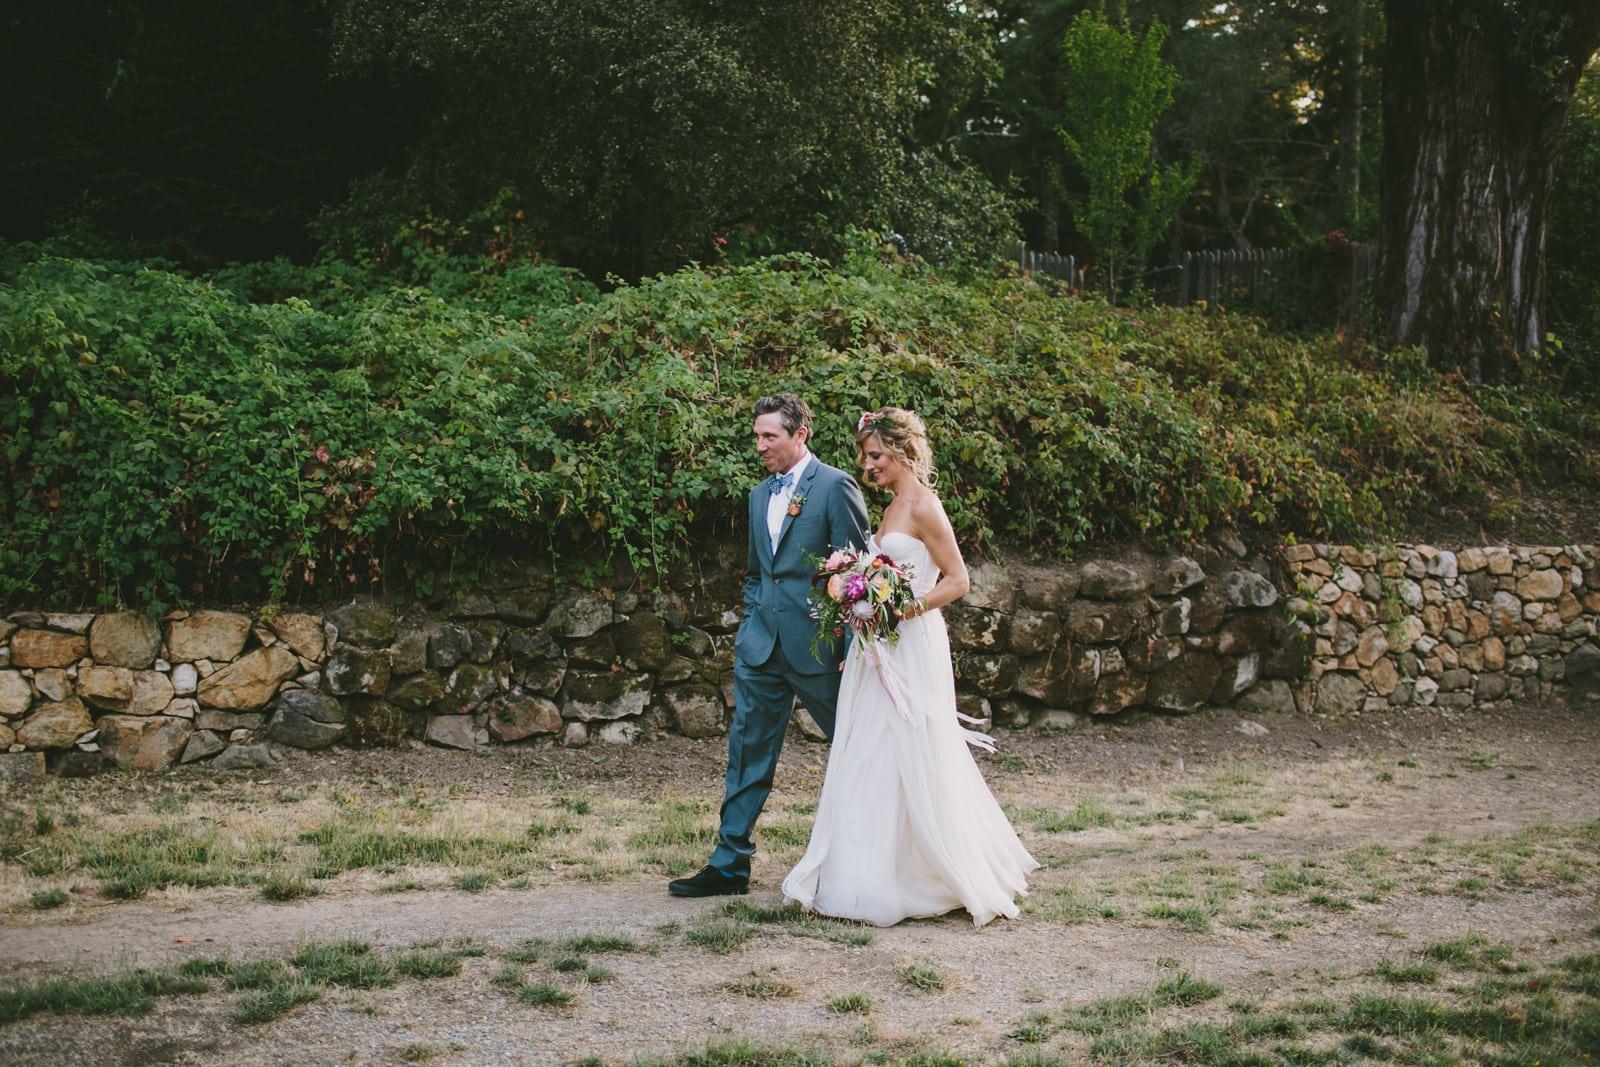 radonich_ranch_wedding_los_gatos_wedding_066